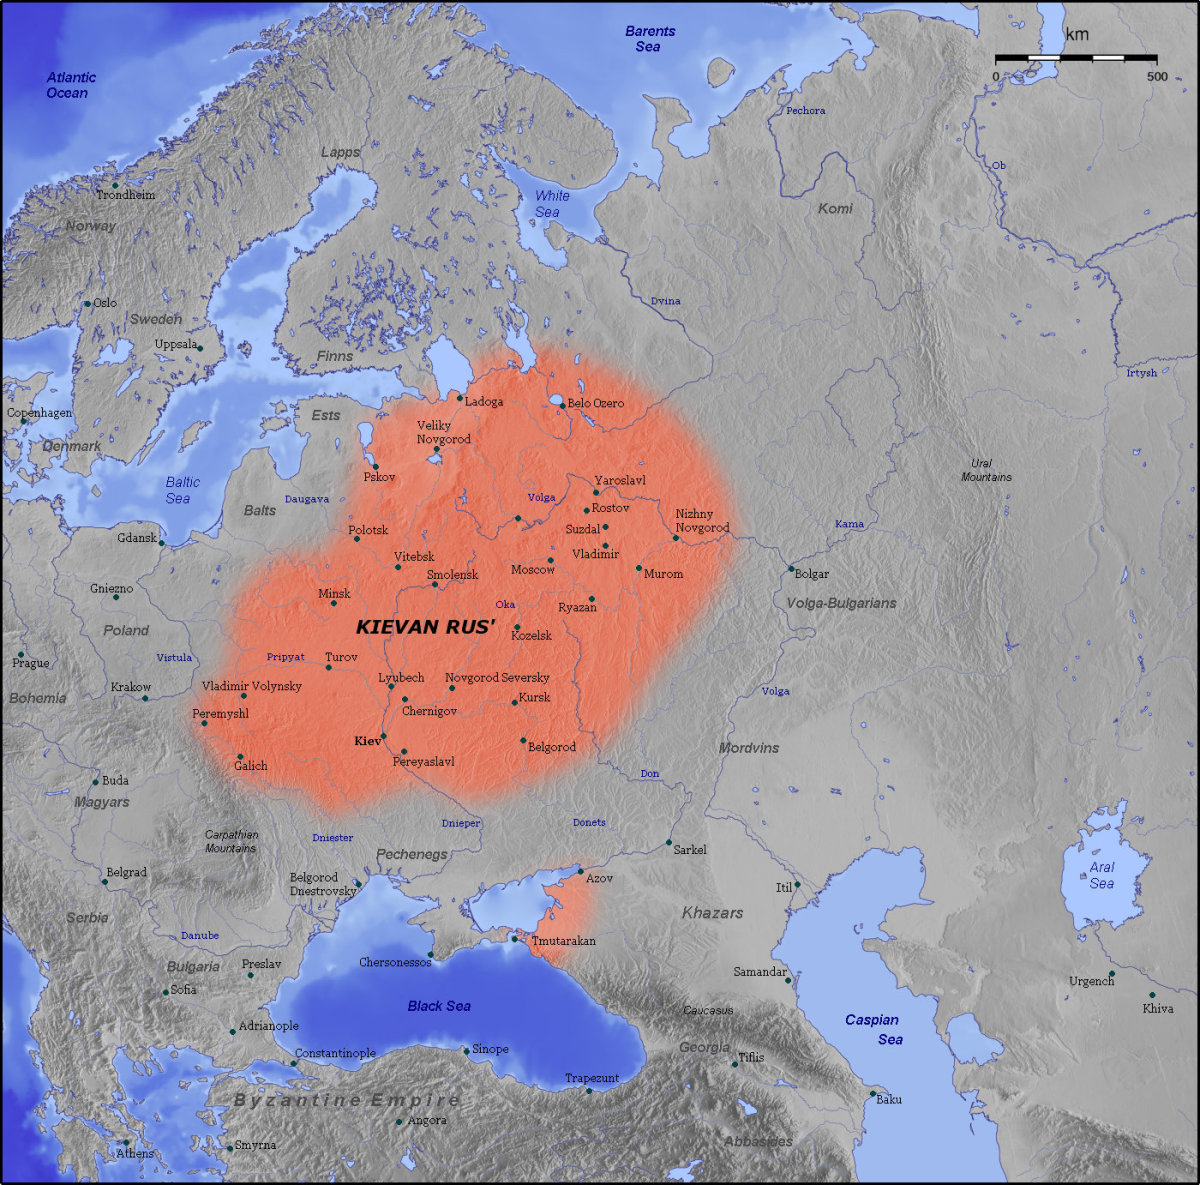 KIEVAN RUS 11TH CENTURY